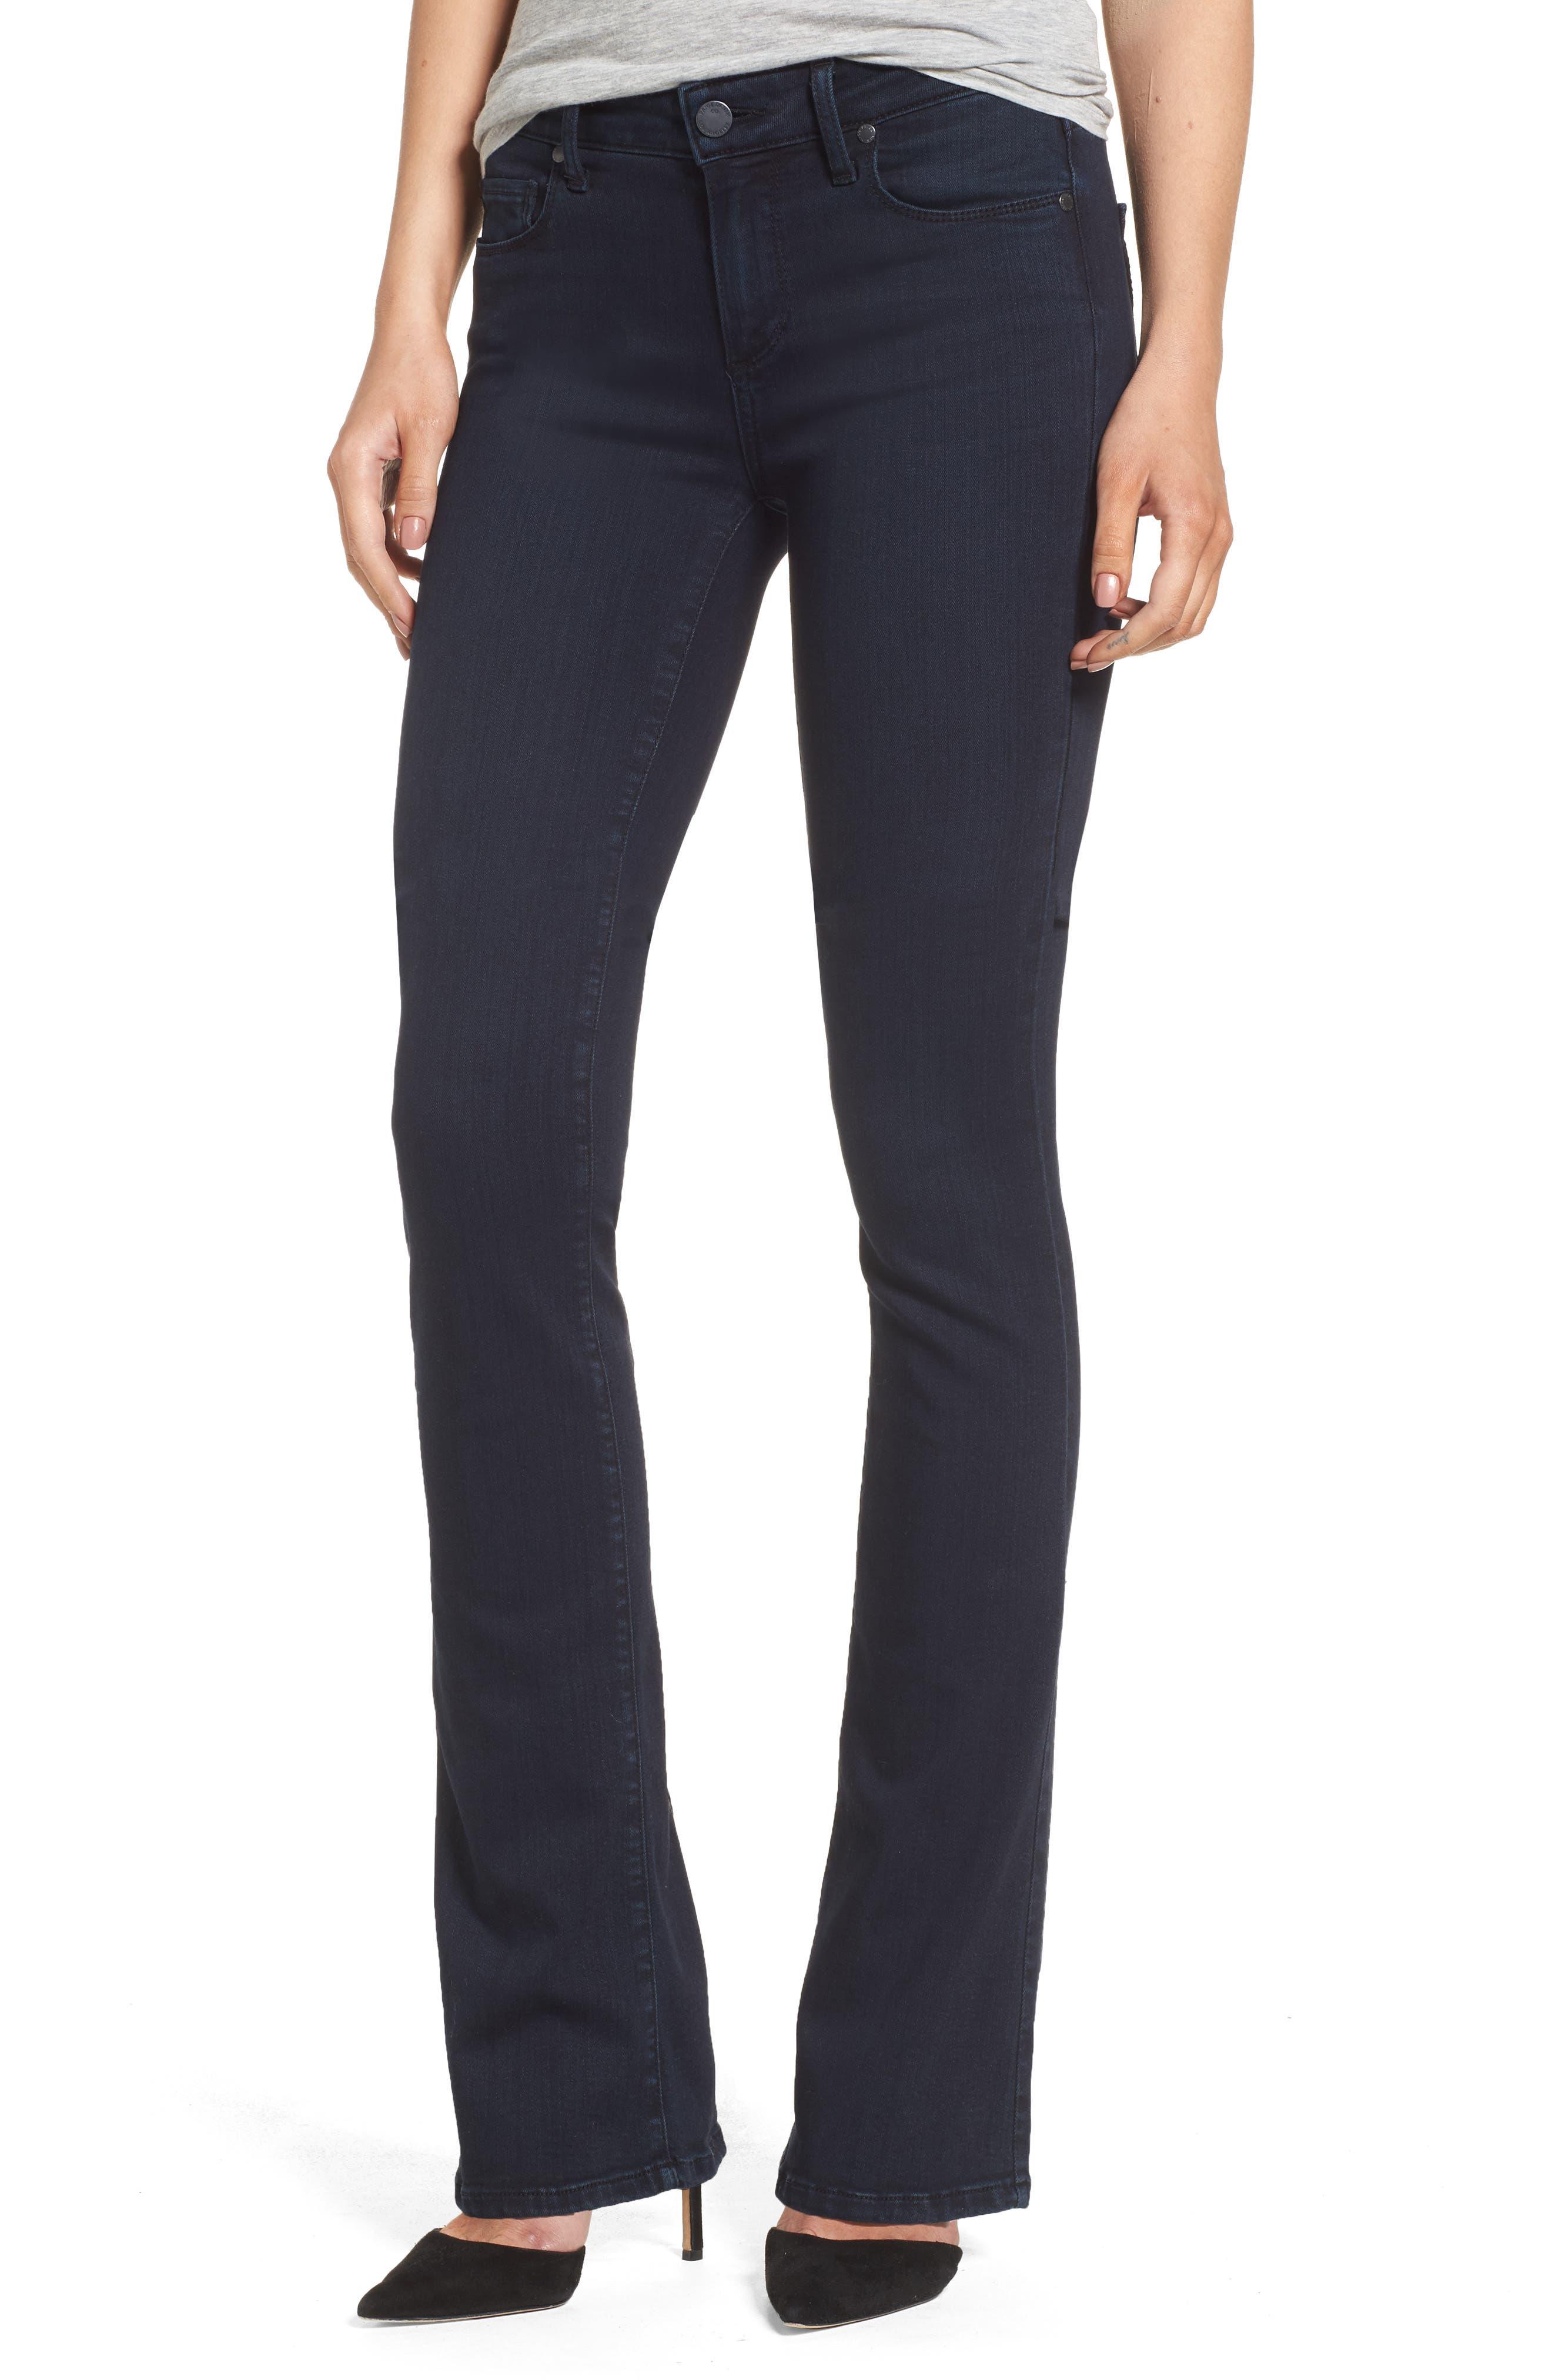 Alternate Image 1 Selected - PAIGE Manhattan High Waist Bootcut Jeans (Brighton)